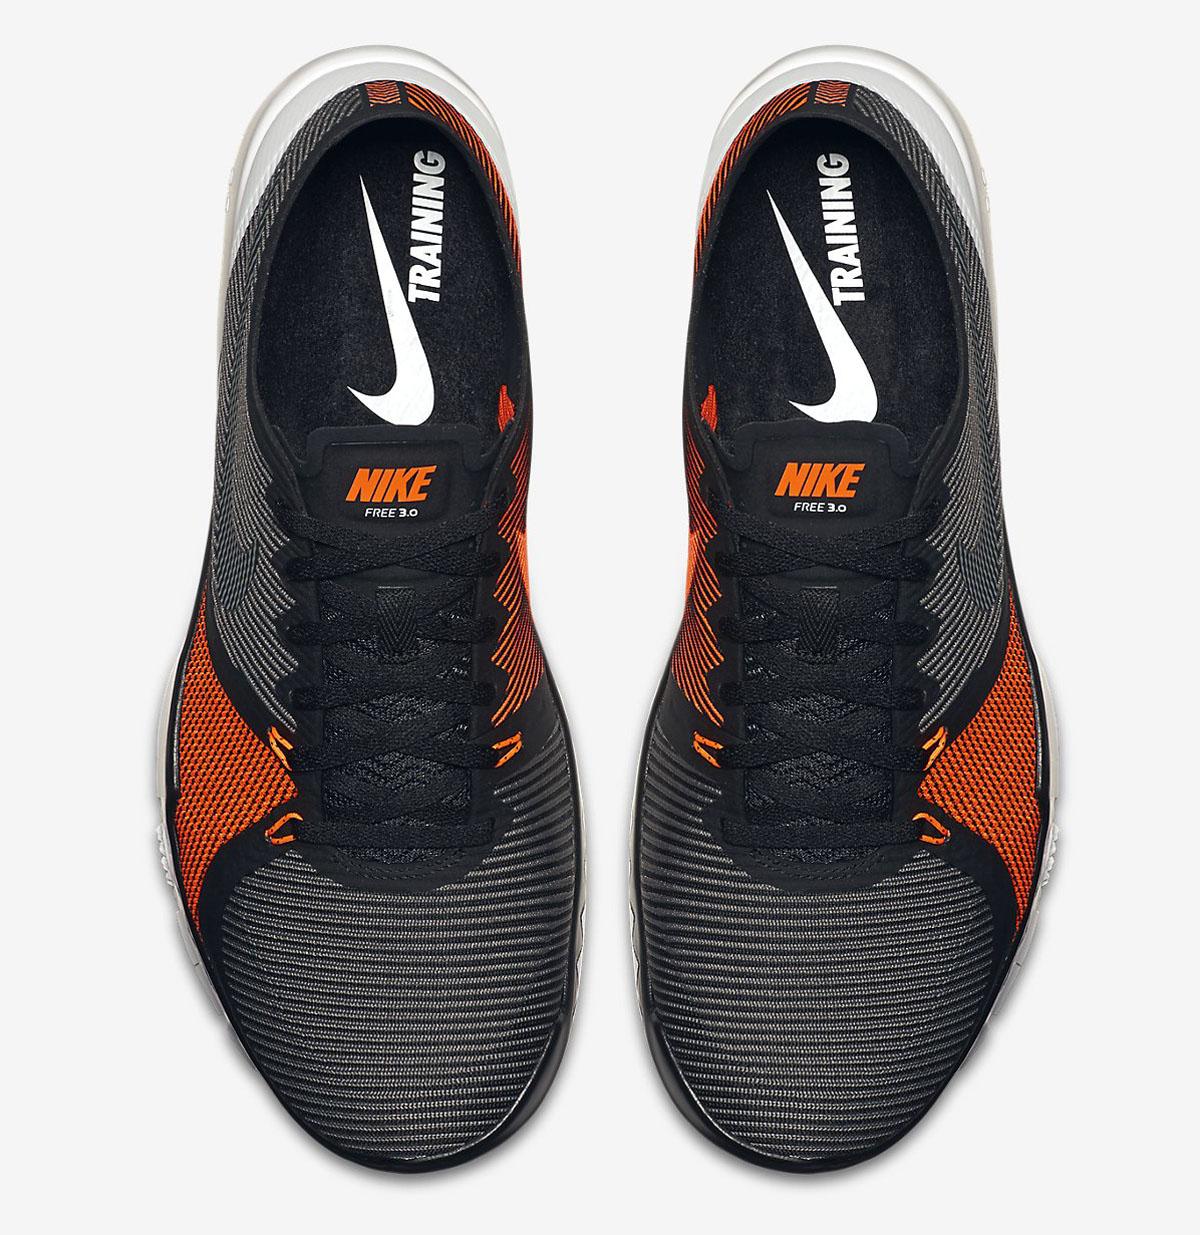 716be2126d6e ... canada nike free trainer 3.0 v4 black tumbled grey total orange e88cd  6901c